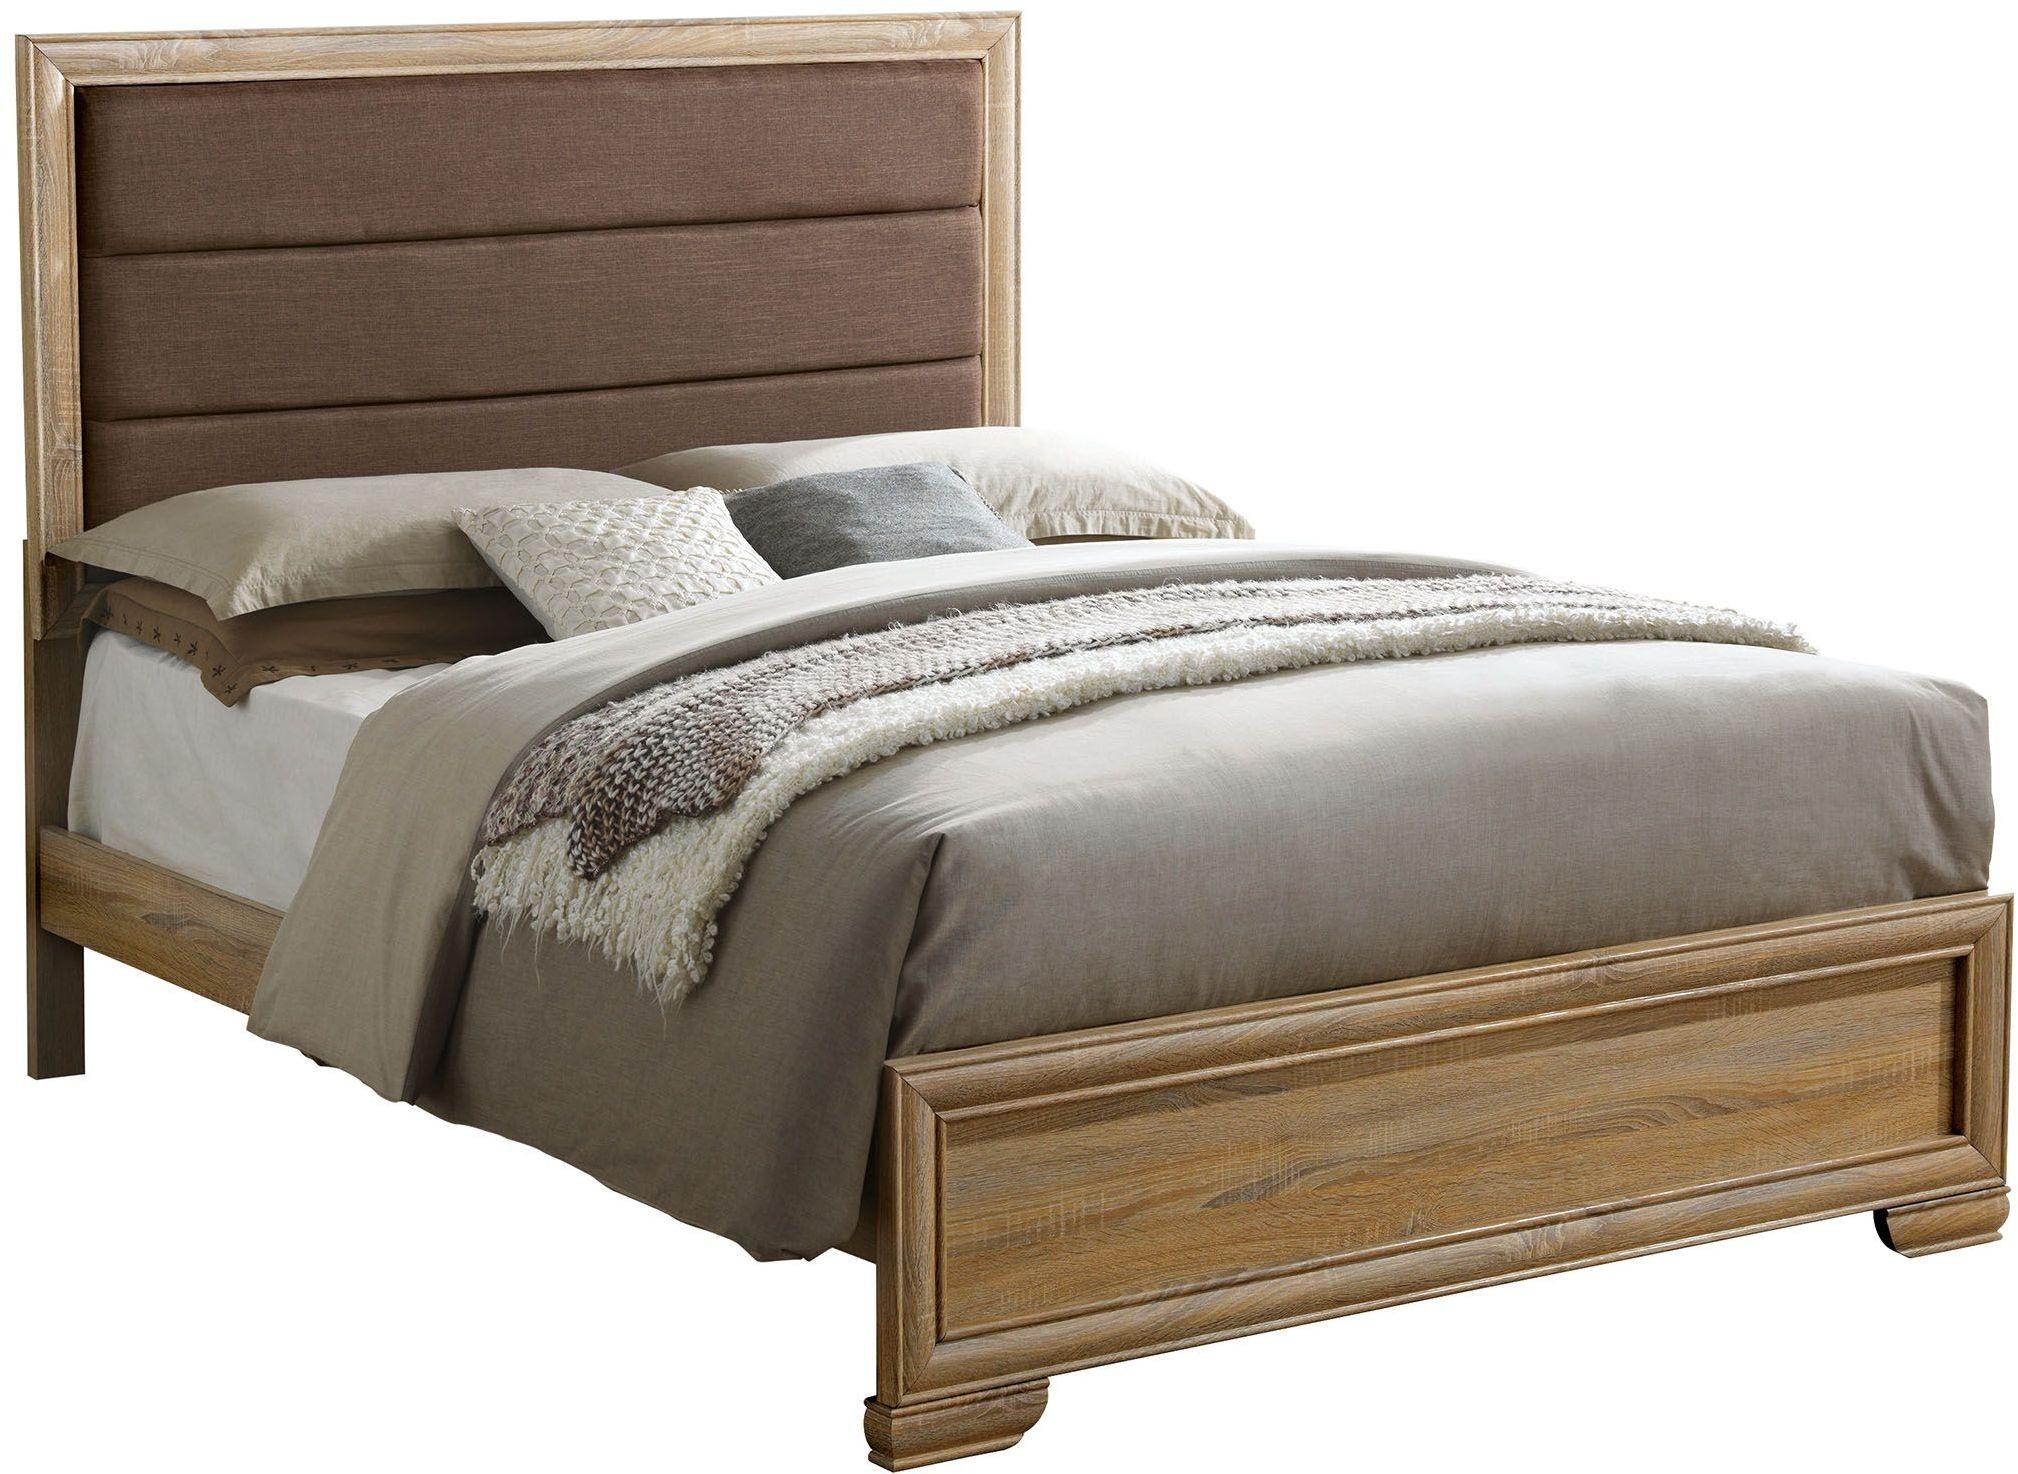 Renee Natural Cal King Upholstered Platform Bed From